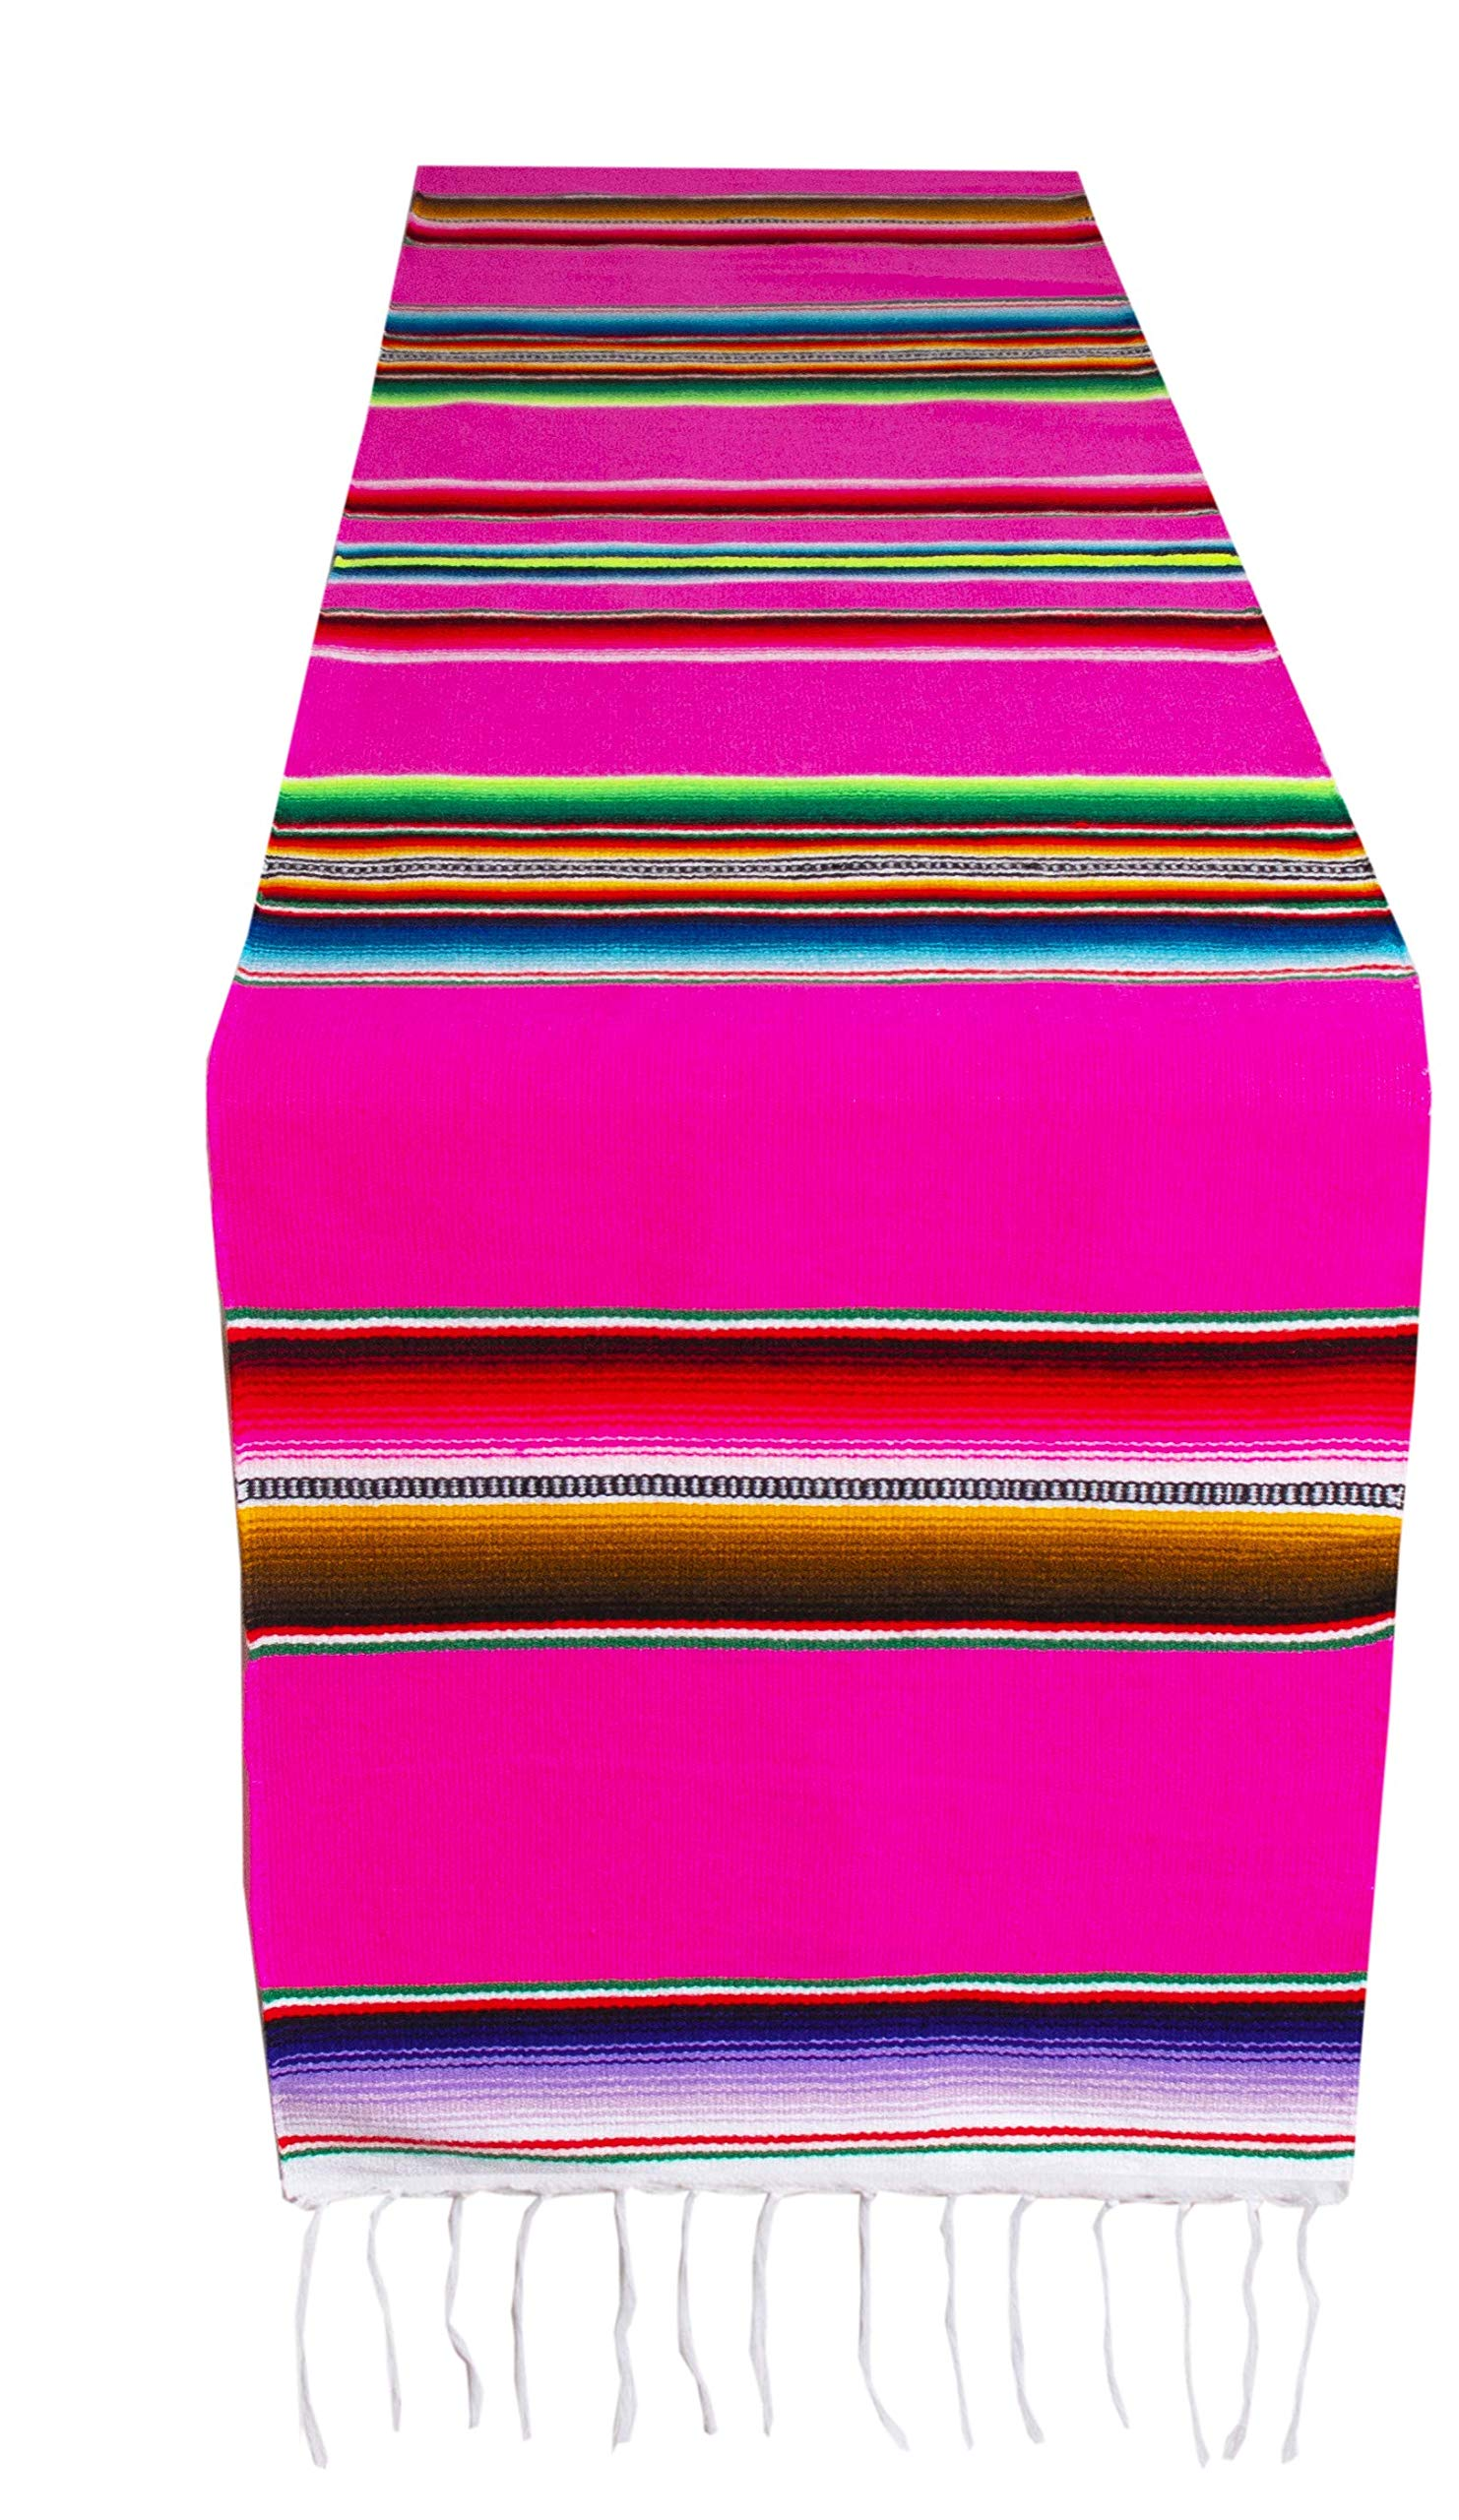 Threads West Genuine Mexican Premium Handwoven Bright MexicanTable Runner Saltillo Serape Colorful Striped Sarape 60'' x 12'' (Pink)